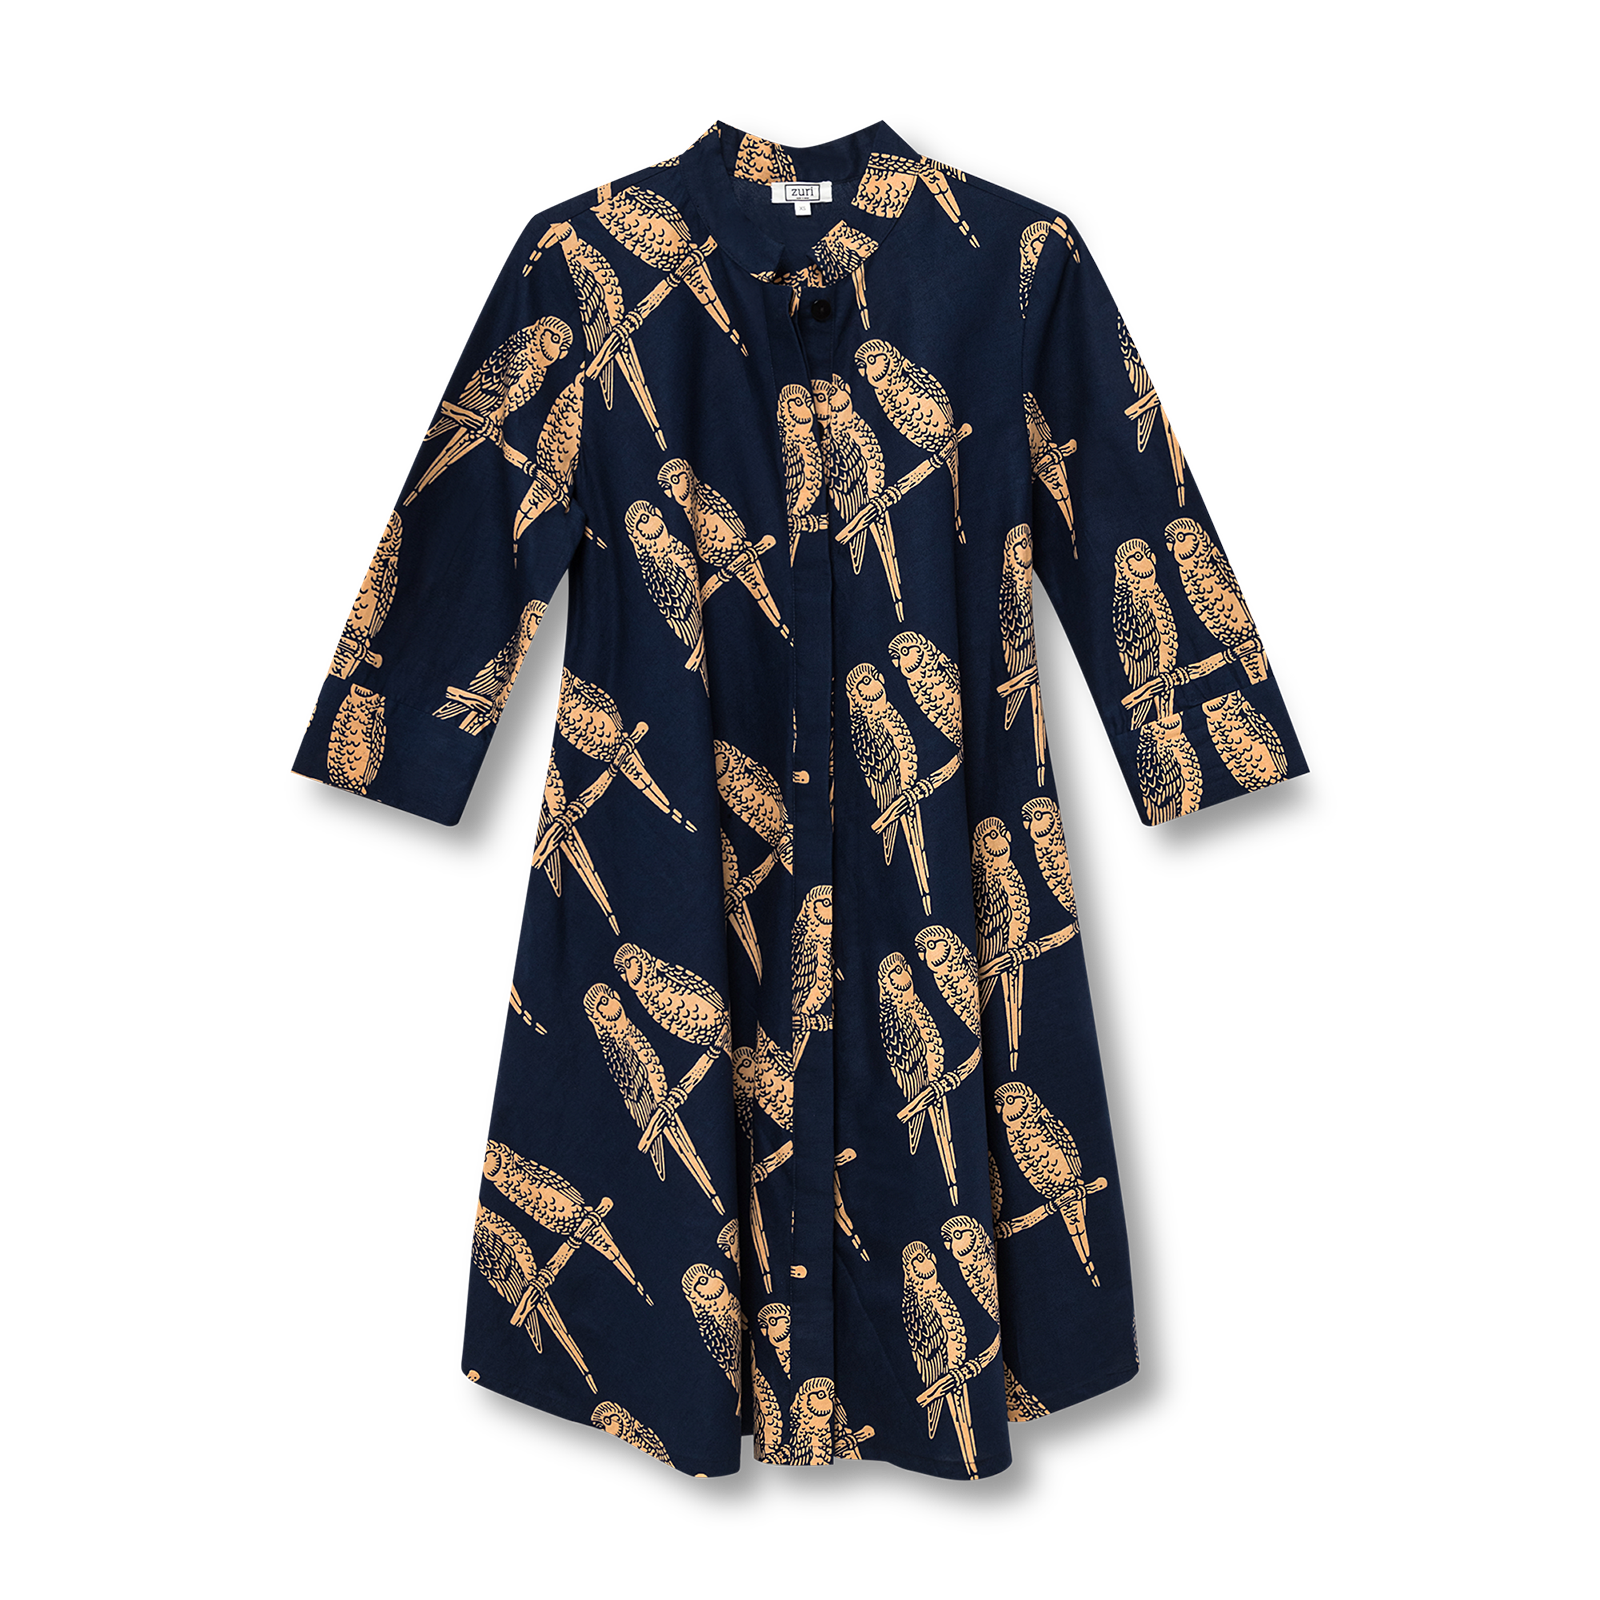 Hanging dress product image